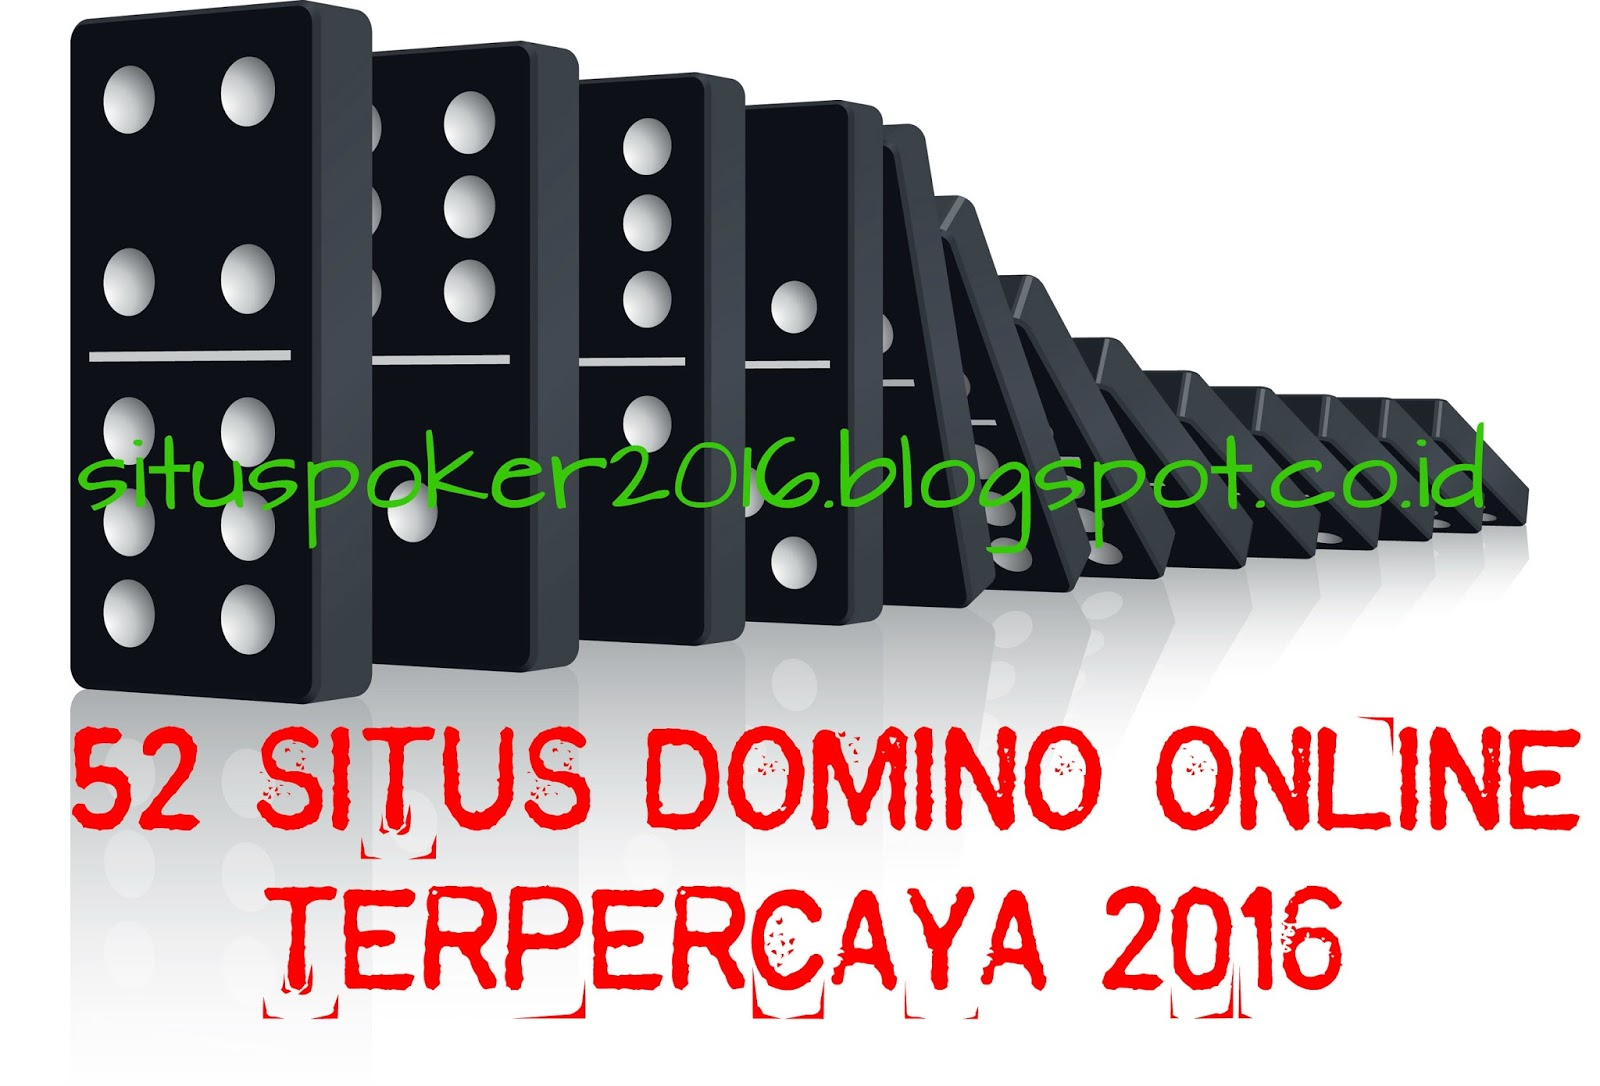 sayapoker com agen judi poker dan domino on-line terpercaya indonesia